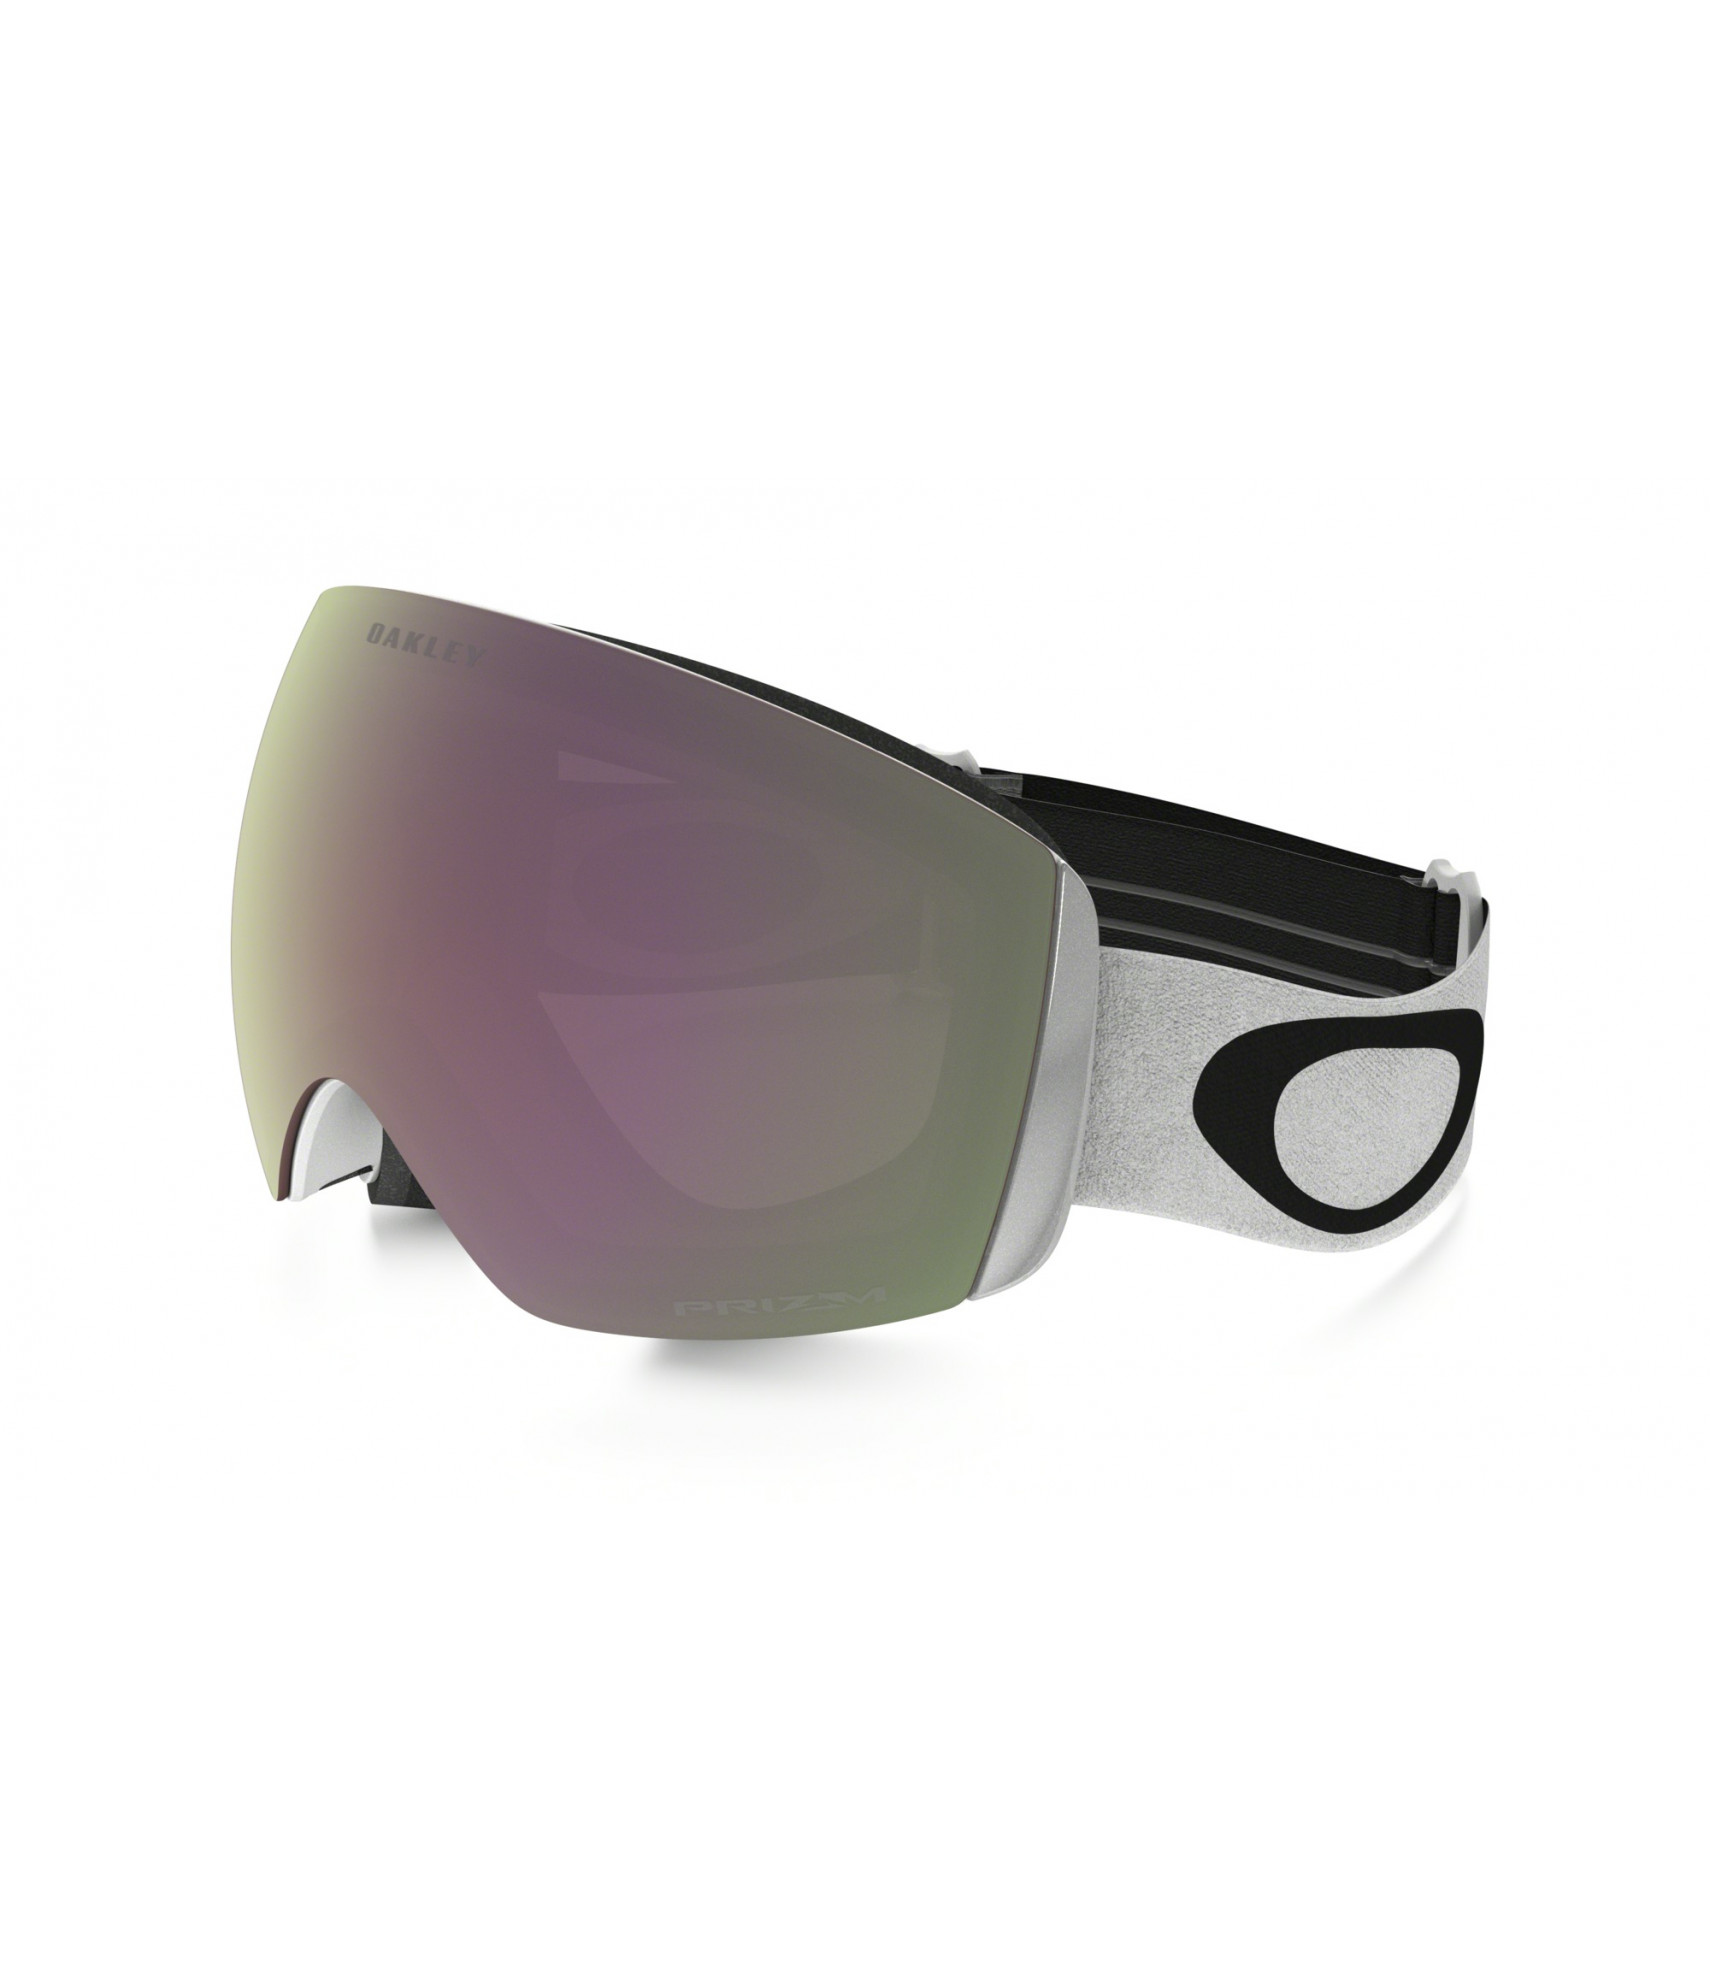 539819b11b Oakley Flight Deck Goggle In White With Prizm Hi-Pink Irid Lens £175.00